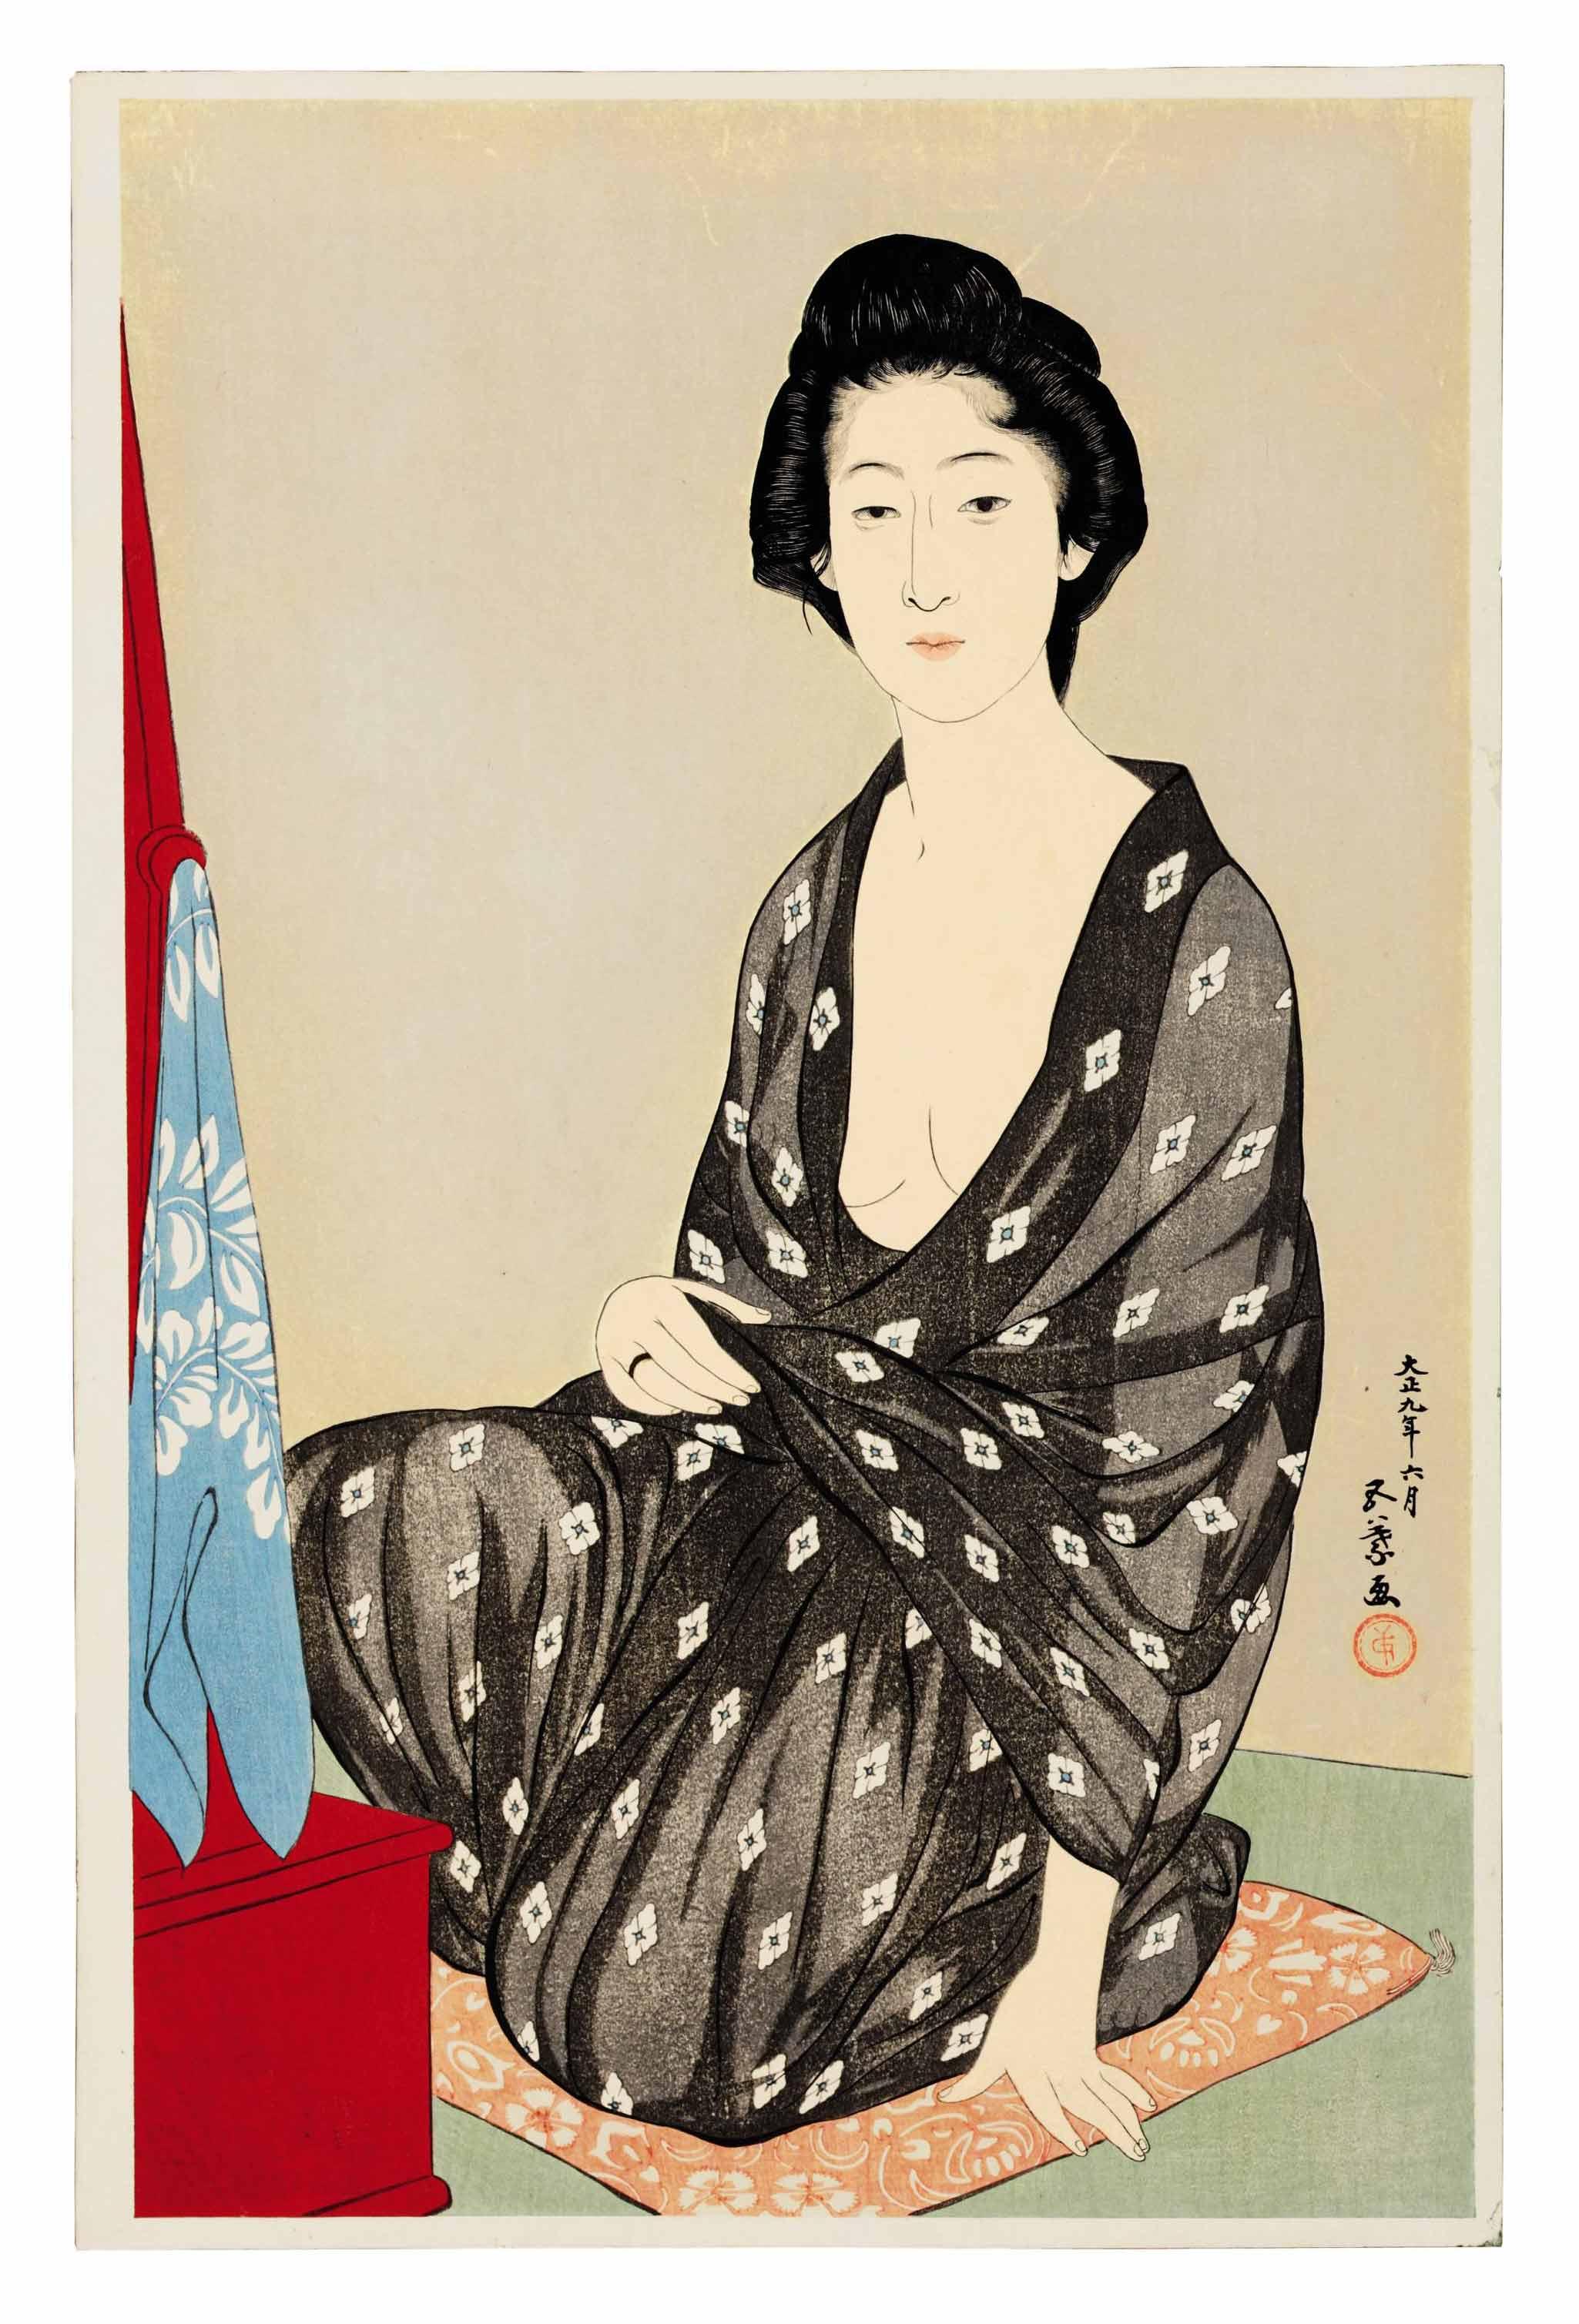 Natsugoromo no onna (Woman in summer clothing), 1920